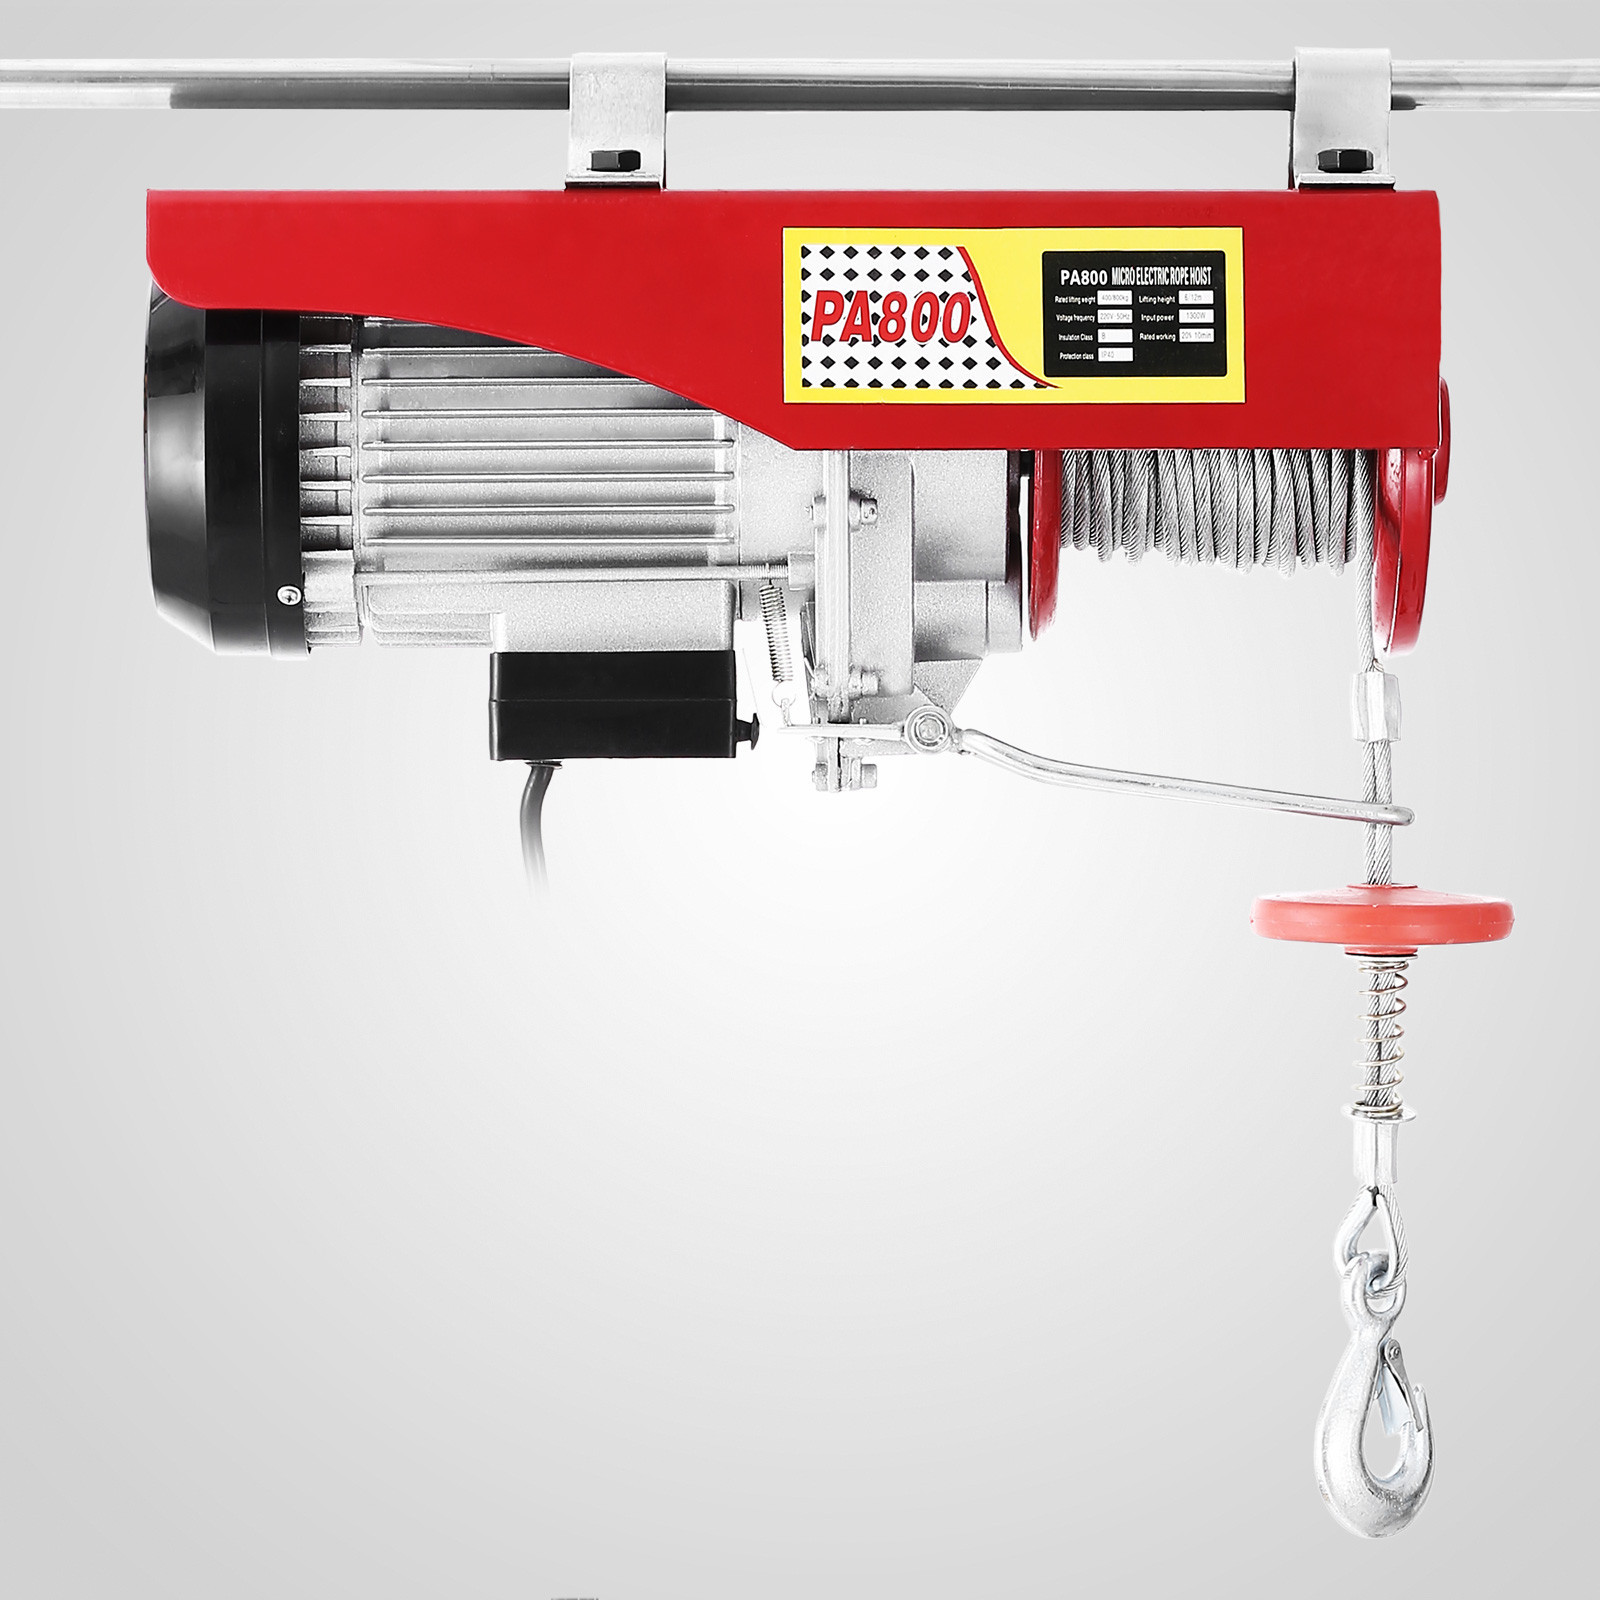 100kg-900kg-Electric-Hoist-Winch-Lifting-Engine-Crane-Cable-Lift-Hook-Garage miniature 52